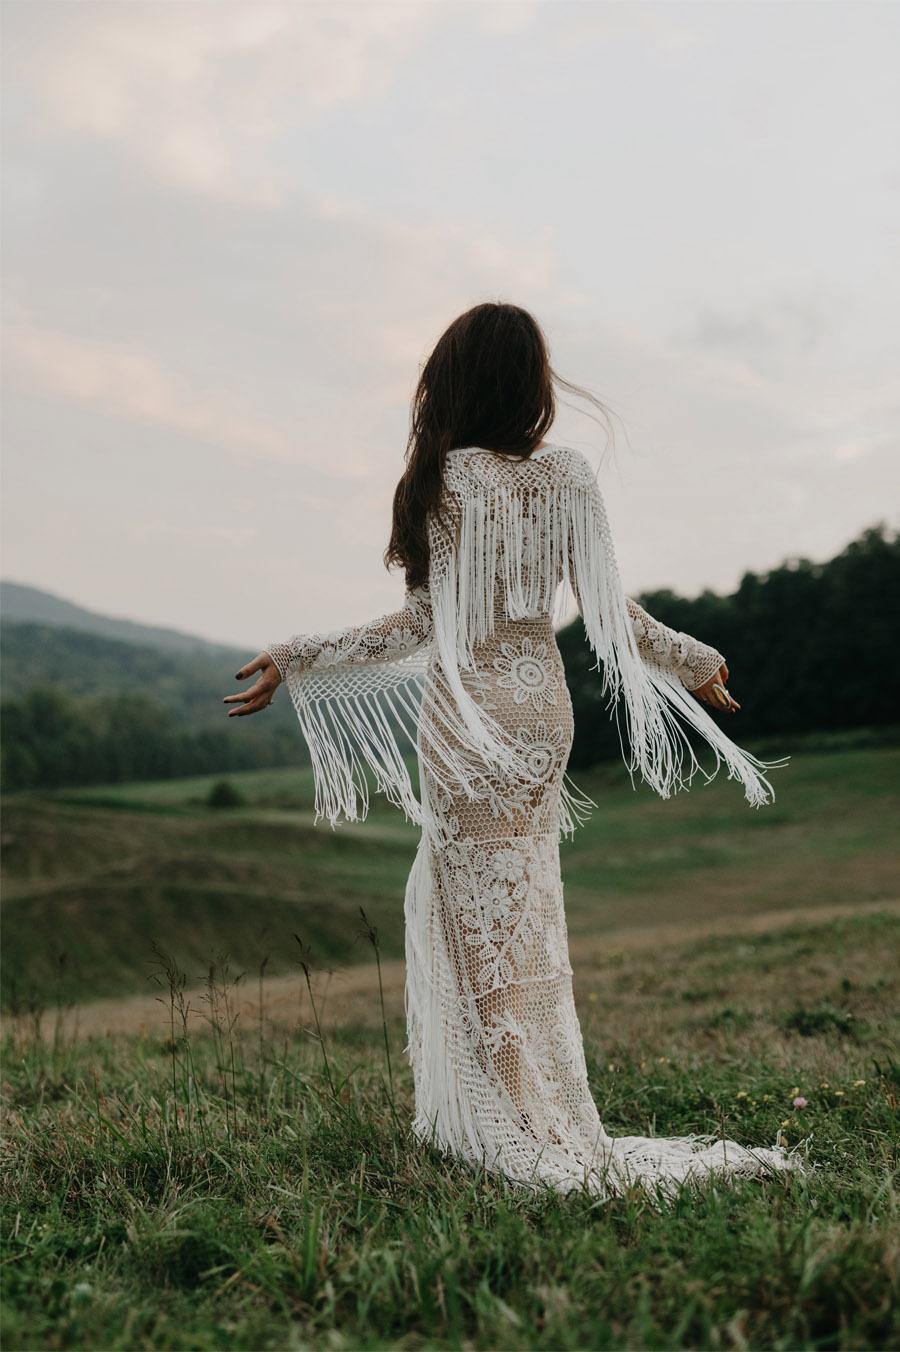 VESTIDOS DE NOVIA CON FLECOS vestidos-de-novia-flecos-1